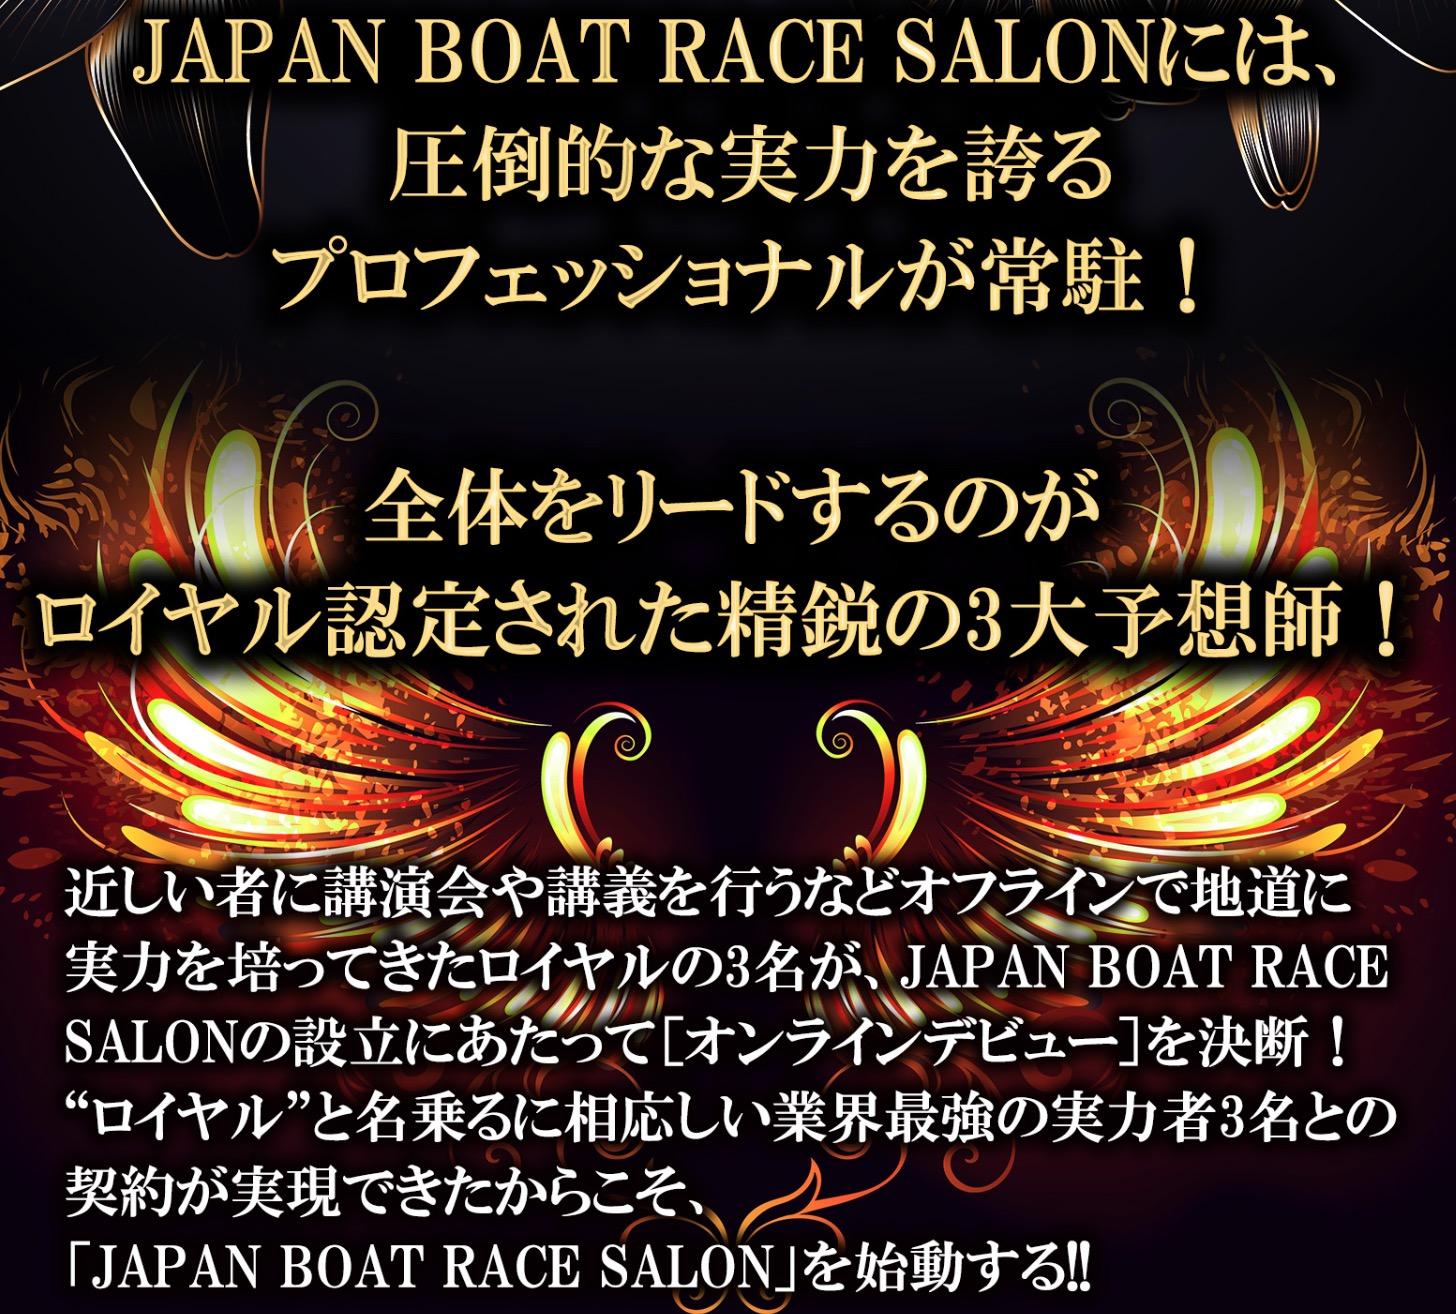 JAPAN BOATRACE SALON(ジャパンボートレースサロン)5